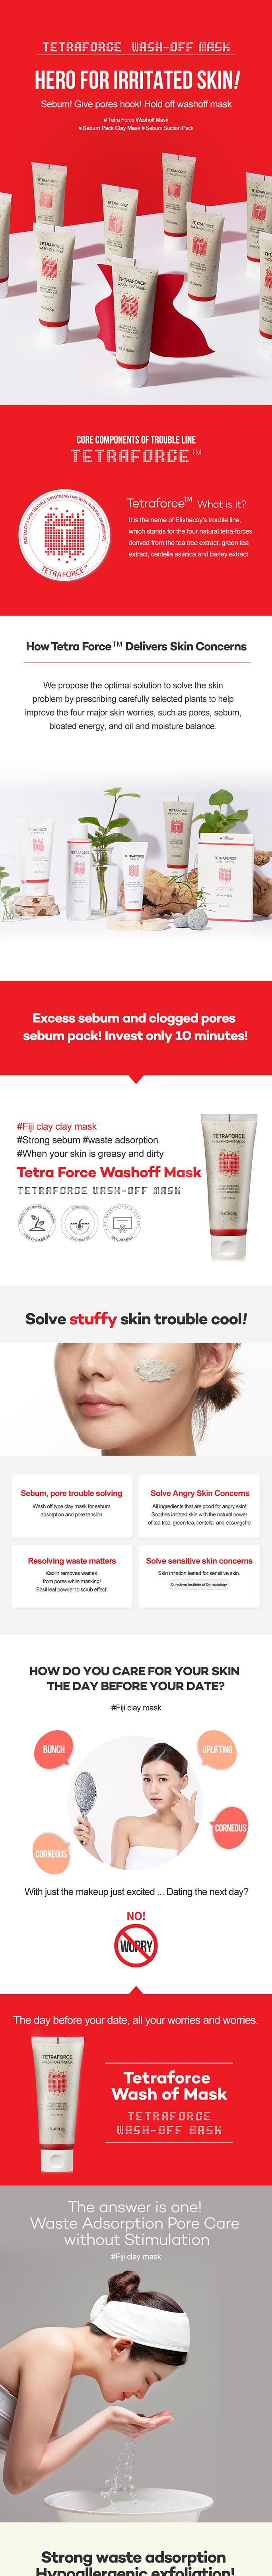 Tetraforce Wash-Off Mask 100g